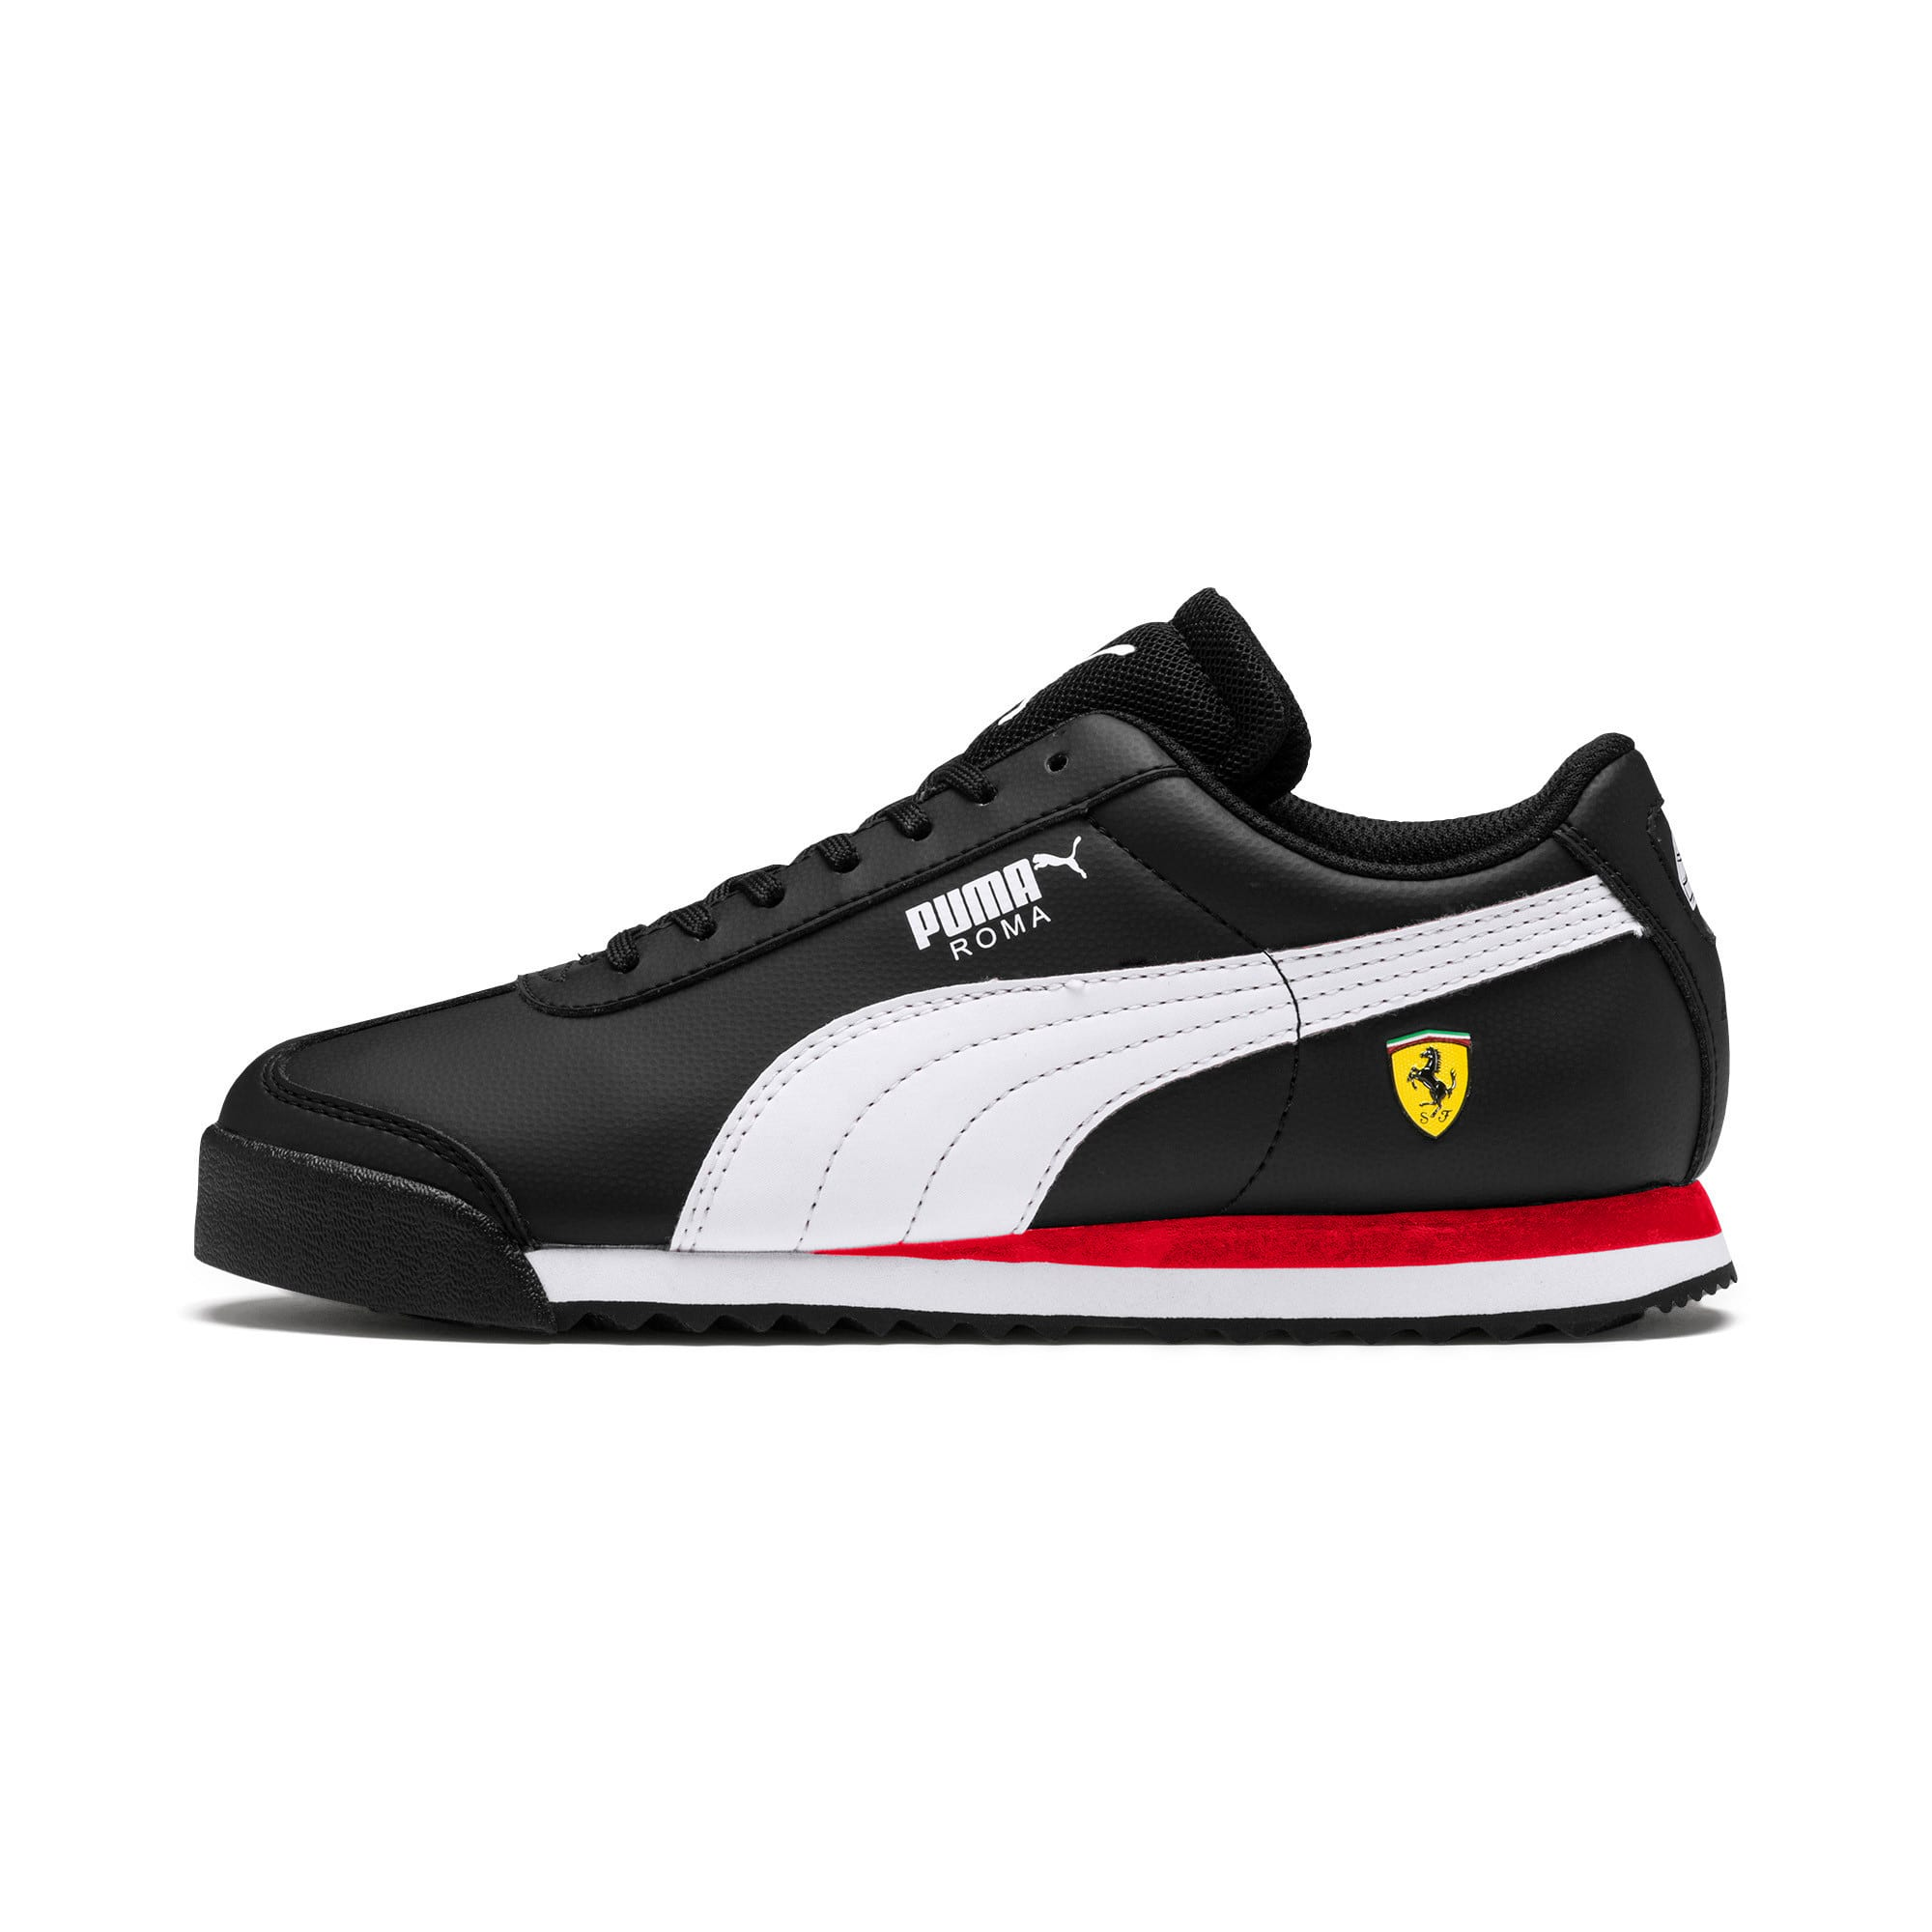 Thumbnail 1 of Ferrari Roma Youth Trainers, Black-White-Rosso Corsa, medium-IND